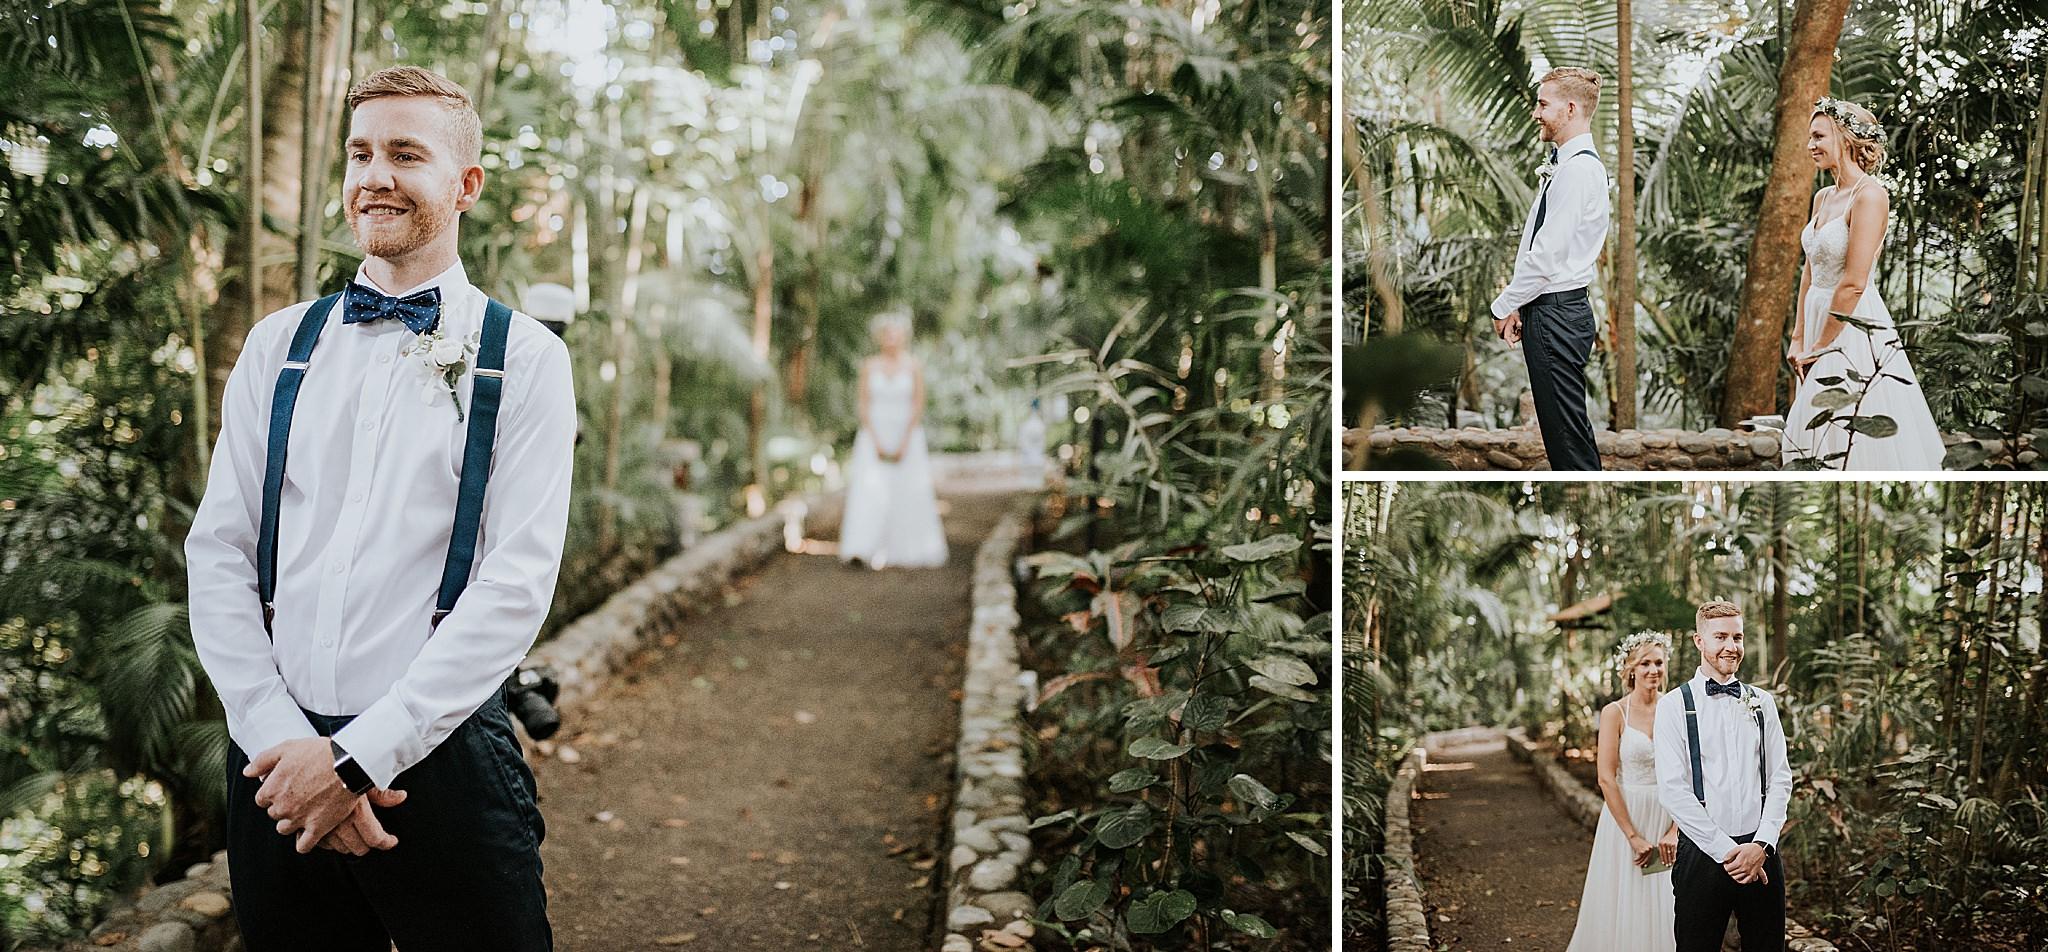 22Kelsey_jacob_beach_wedding_costa_rica_photography_0022.jpg